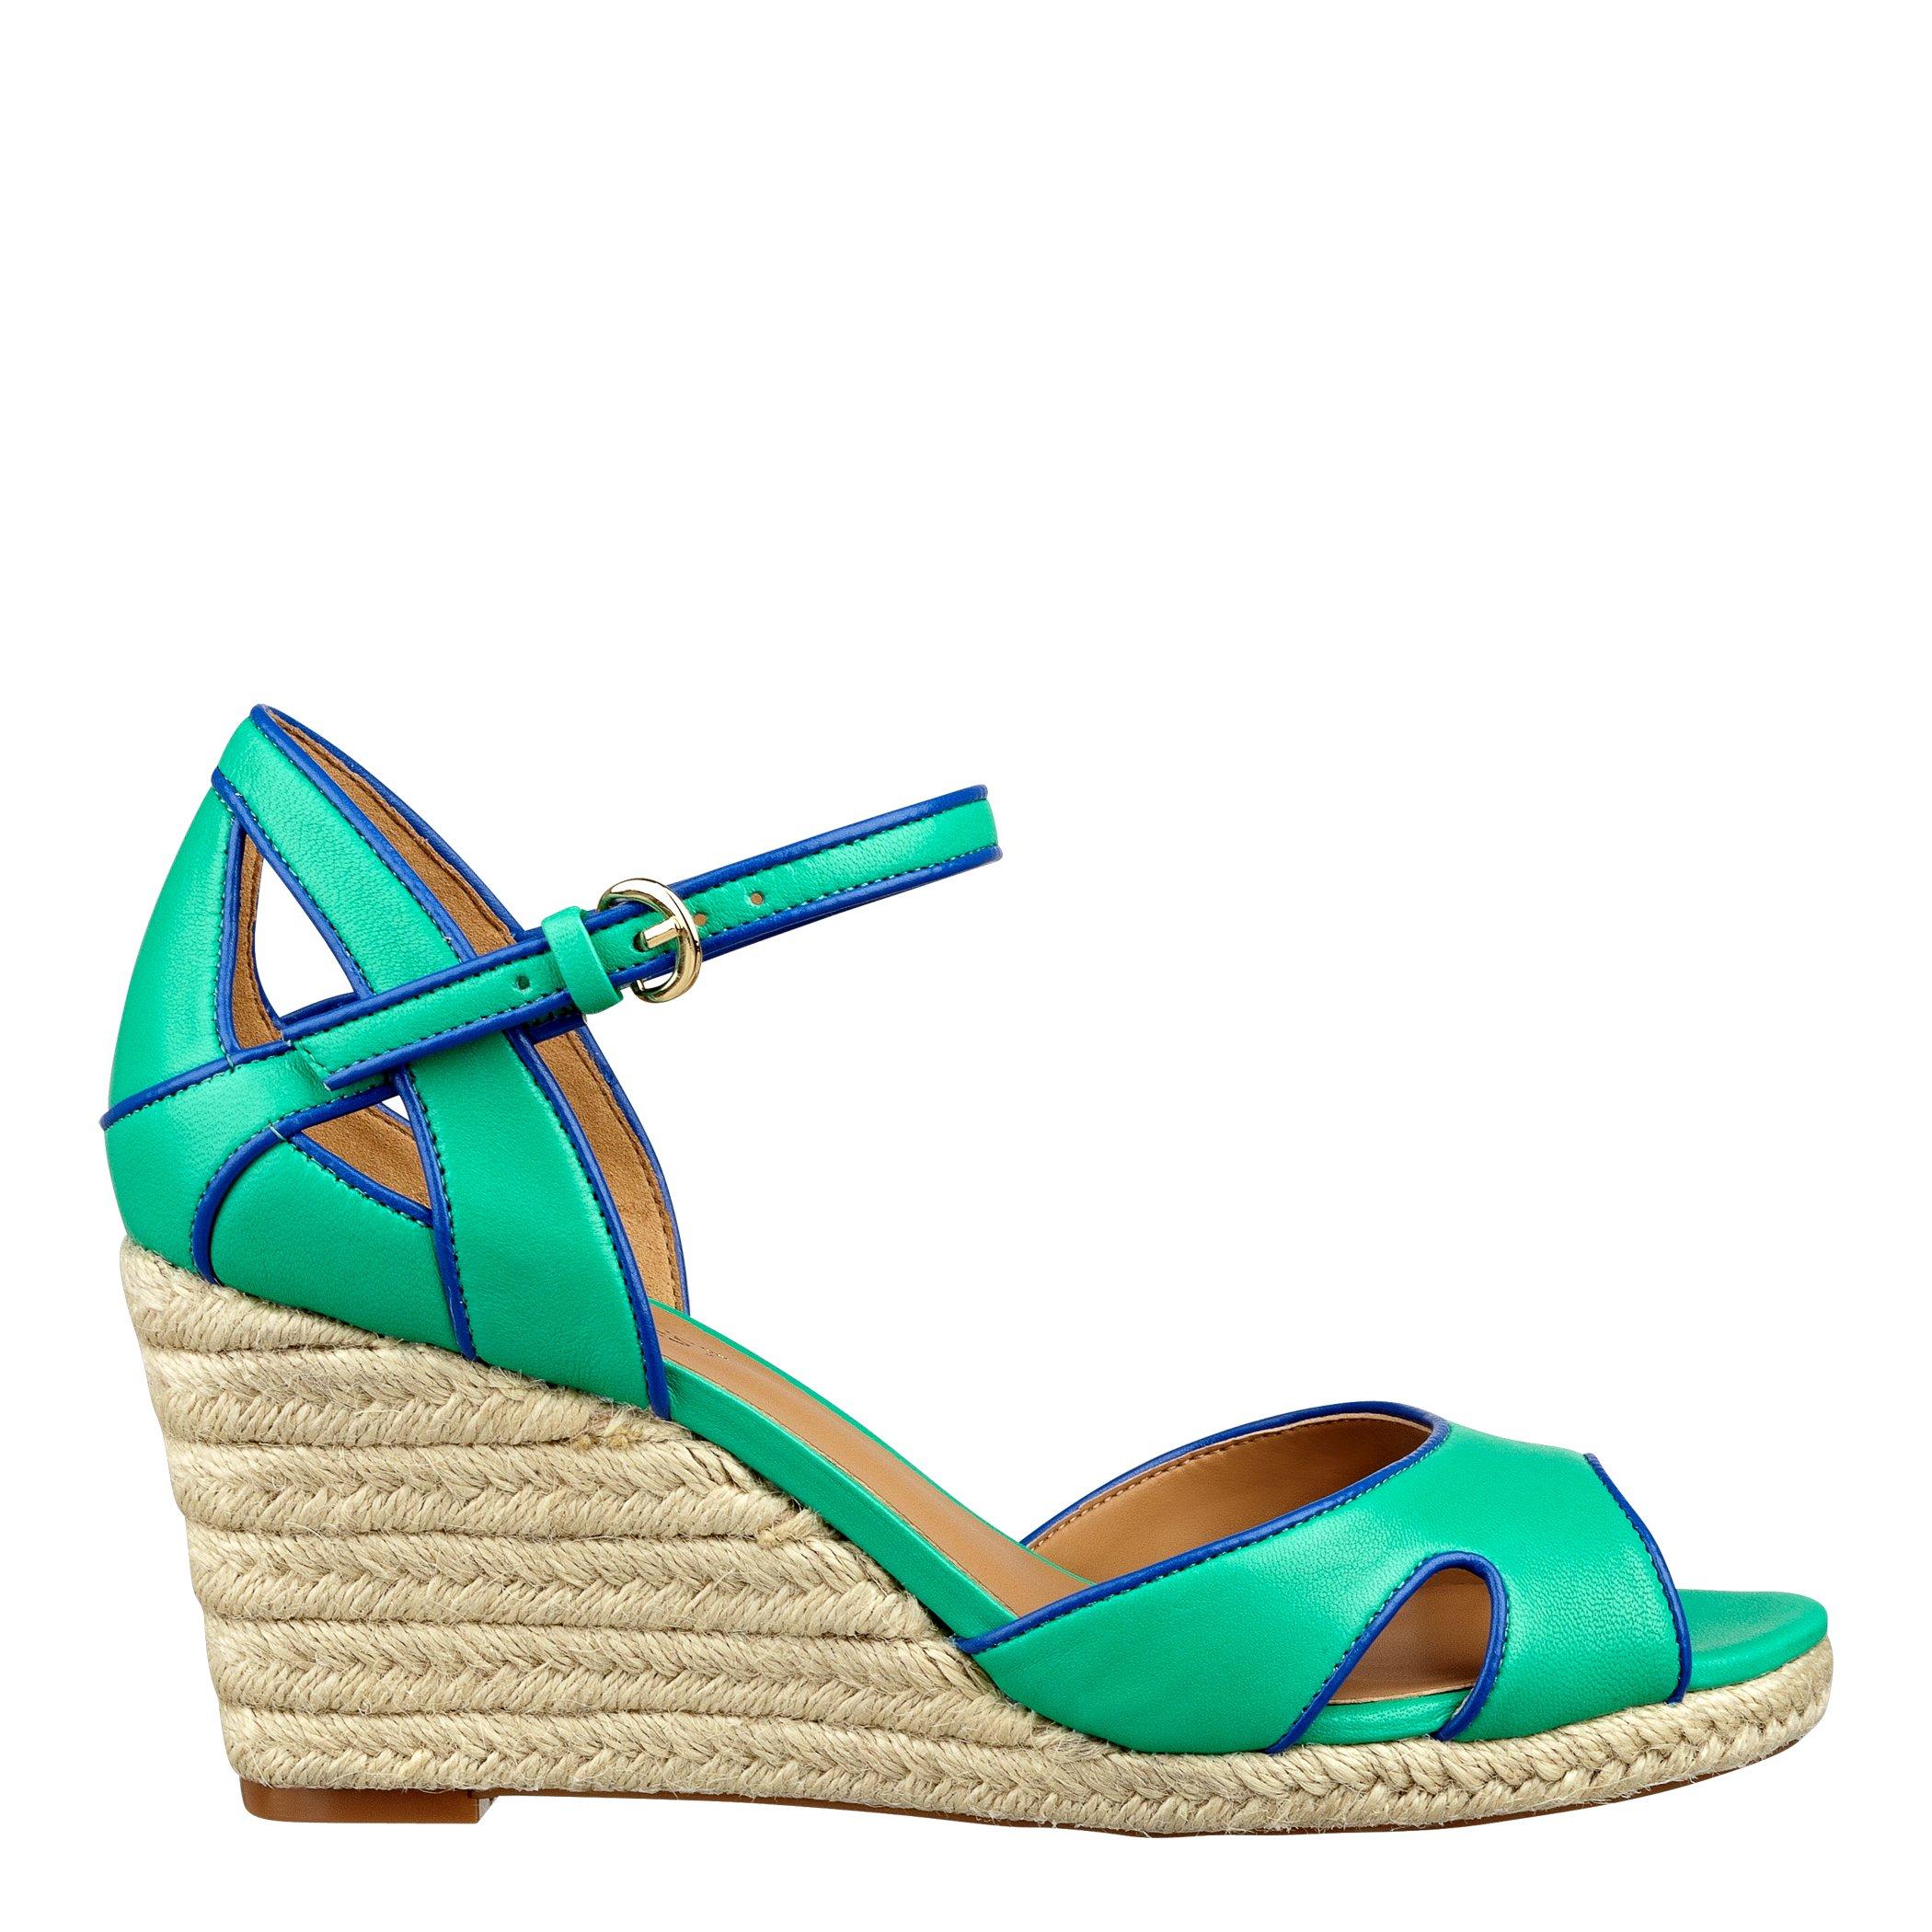 nine west espadrille wedge sandals in green